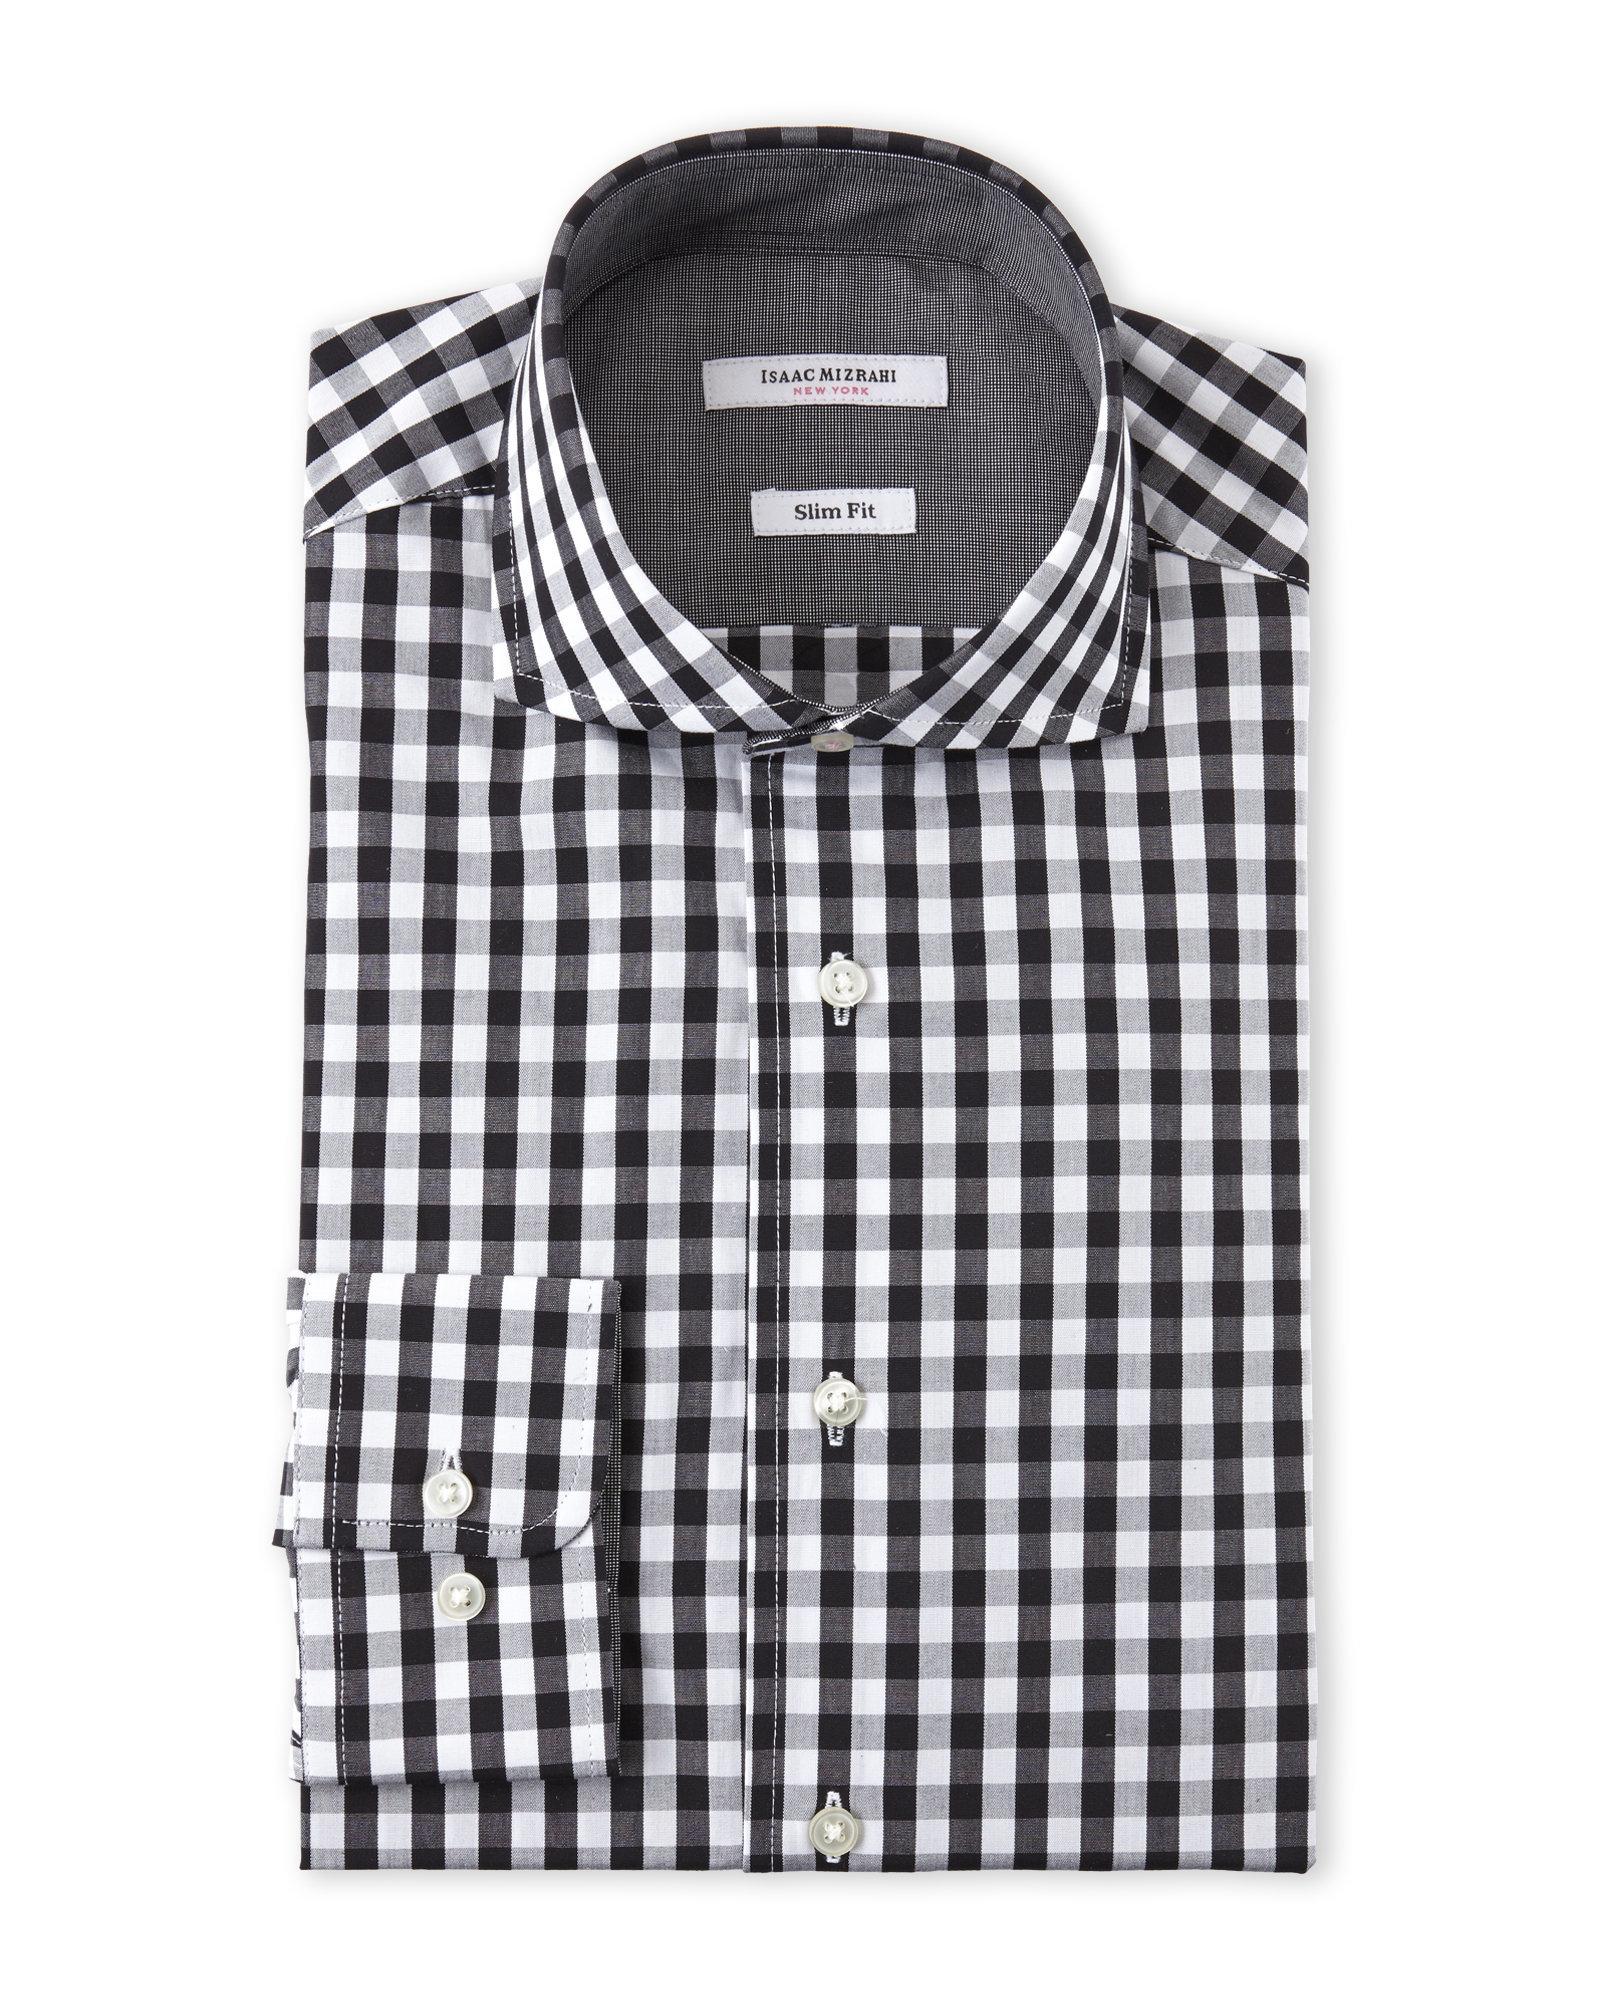 Mens Gingham Check Dress Shirt